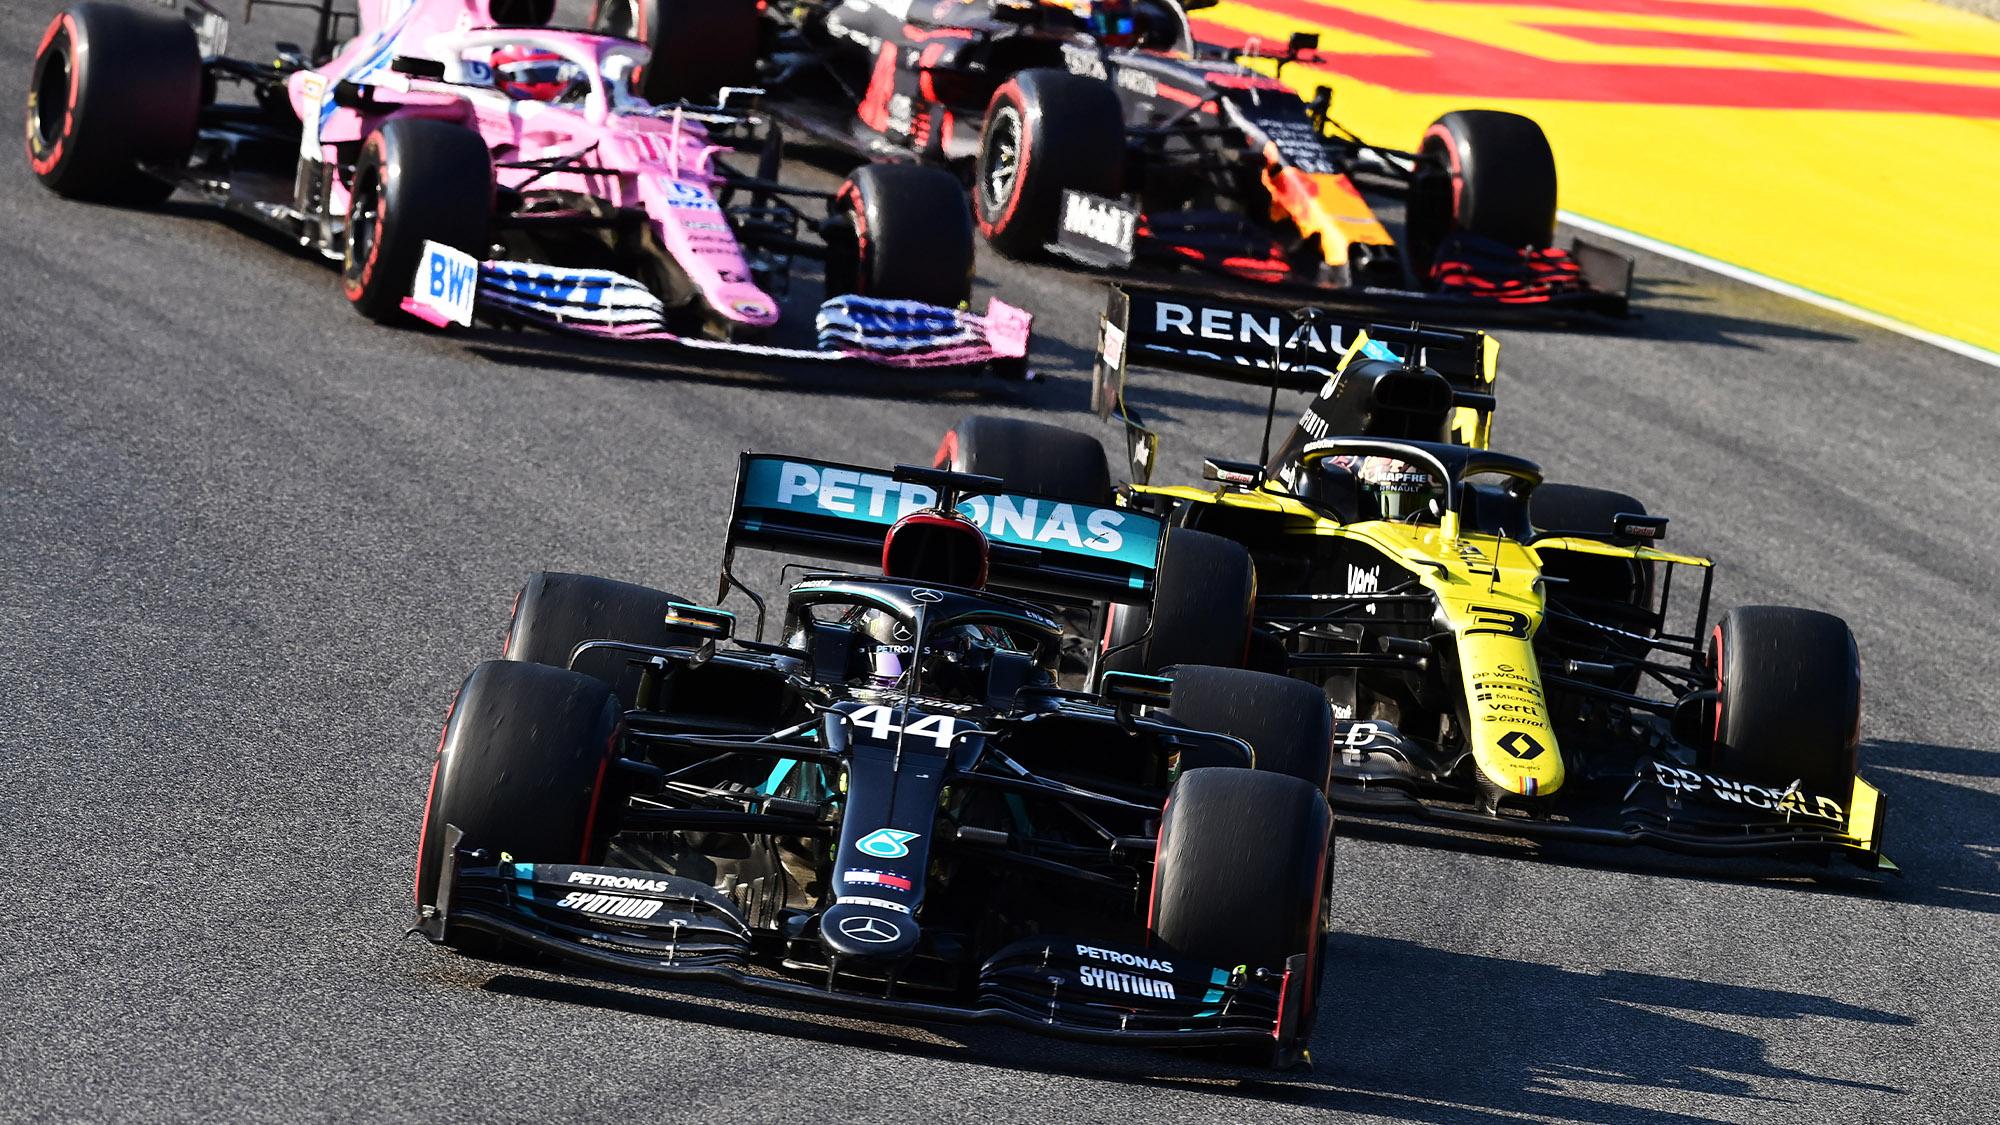 Lewis Hamilton leads Daniel Ricciardo at the third Mugello restart during the 2020 F1 Tuscan Grand Prix